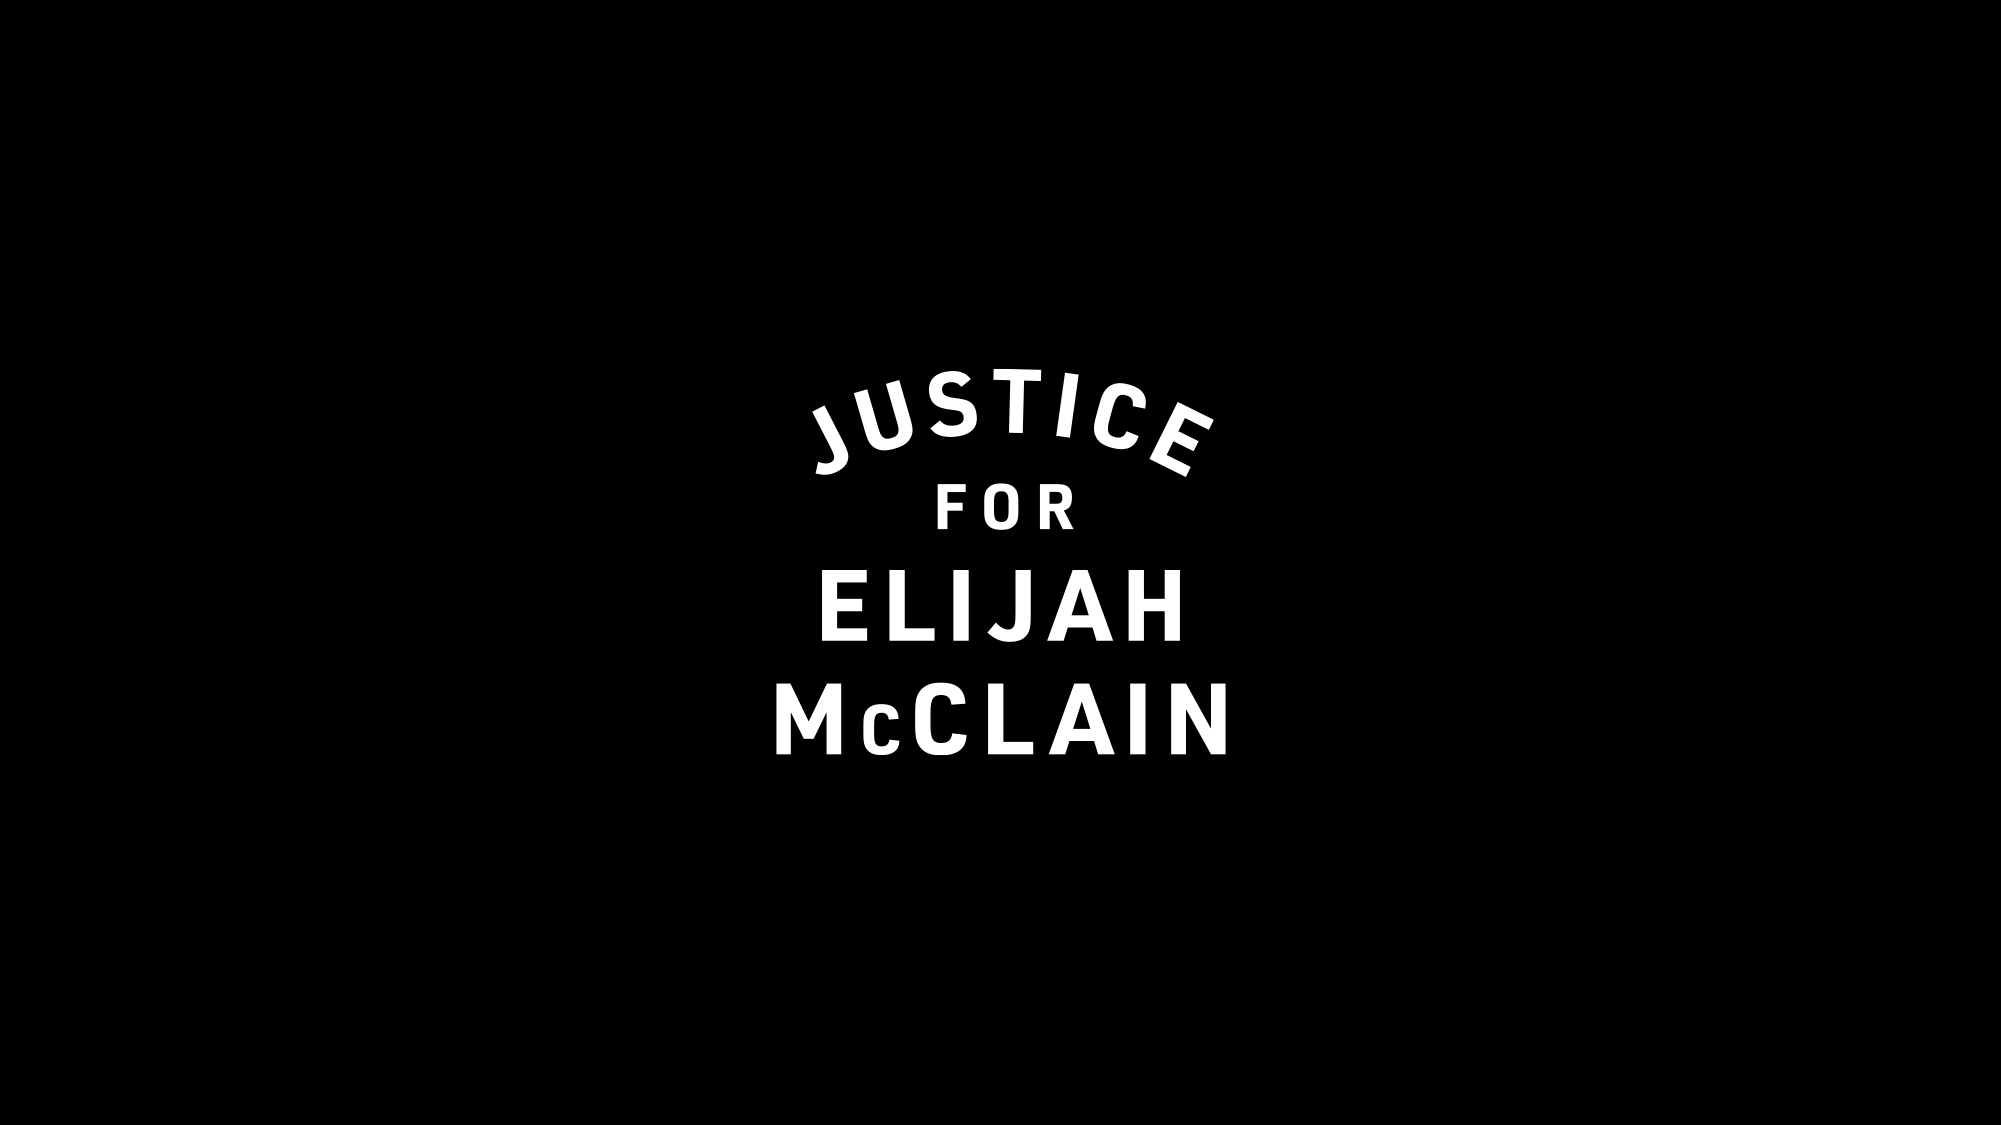 Justice for Elijah McClain